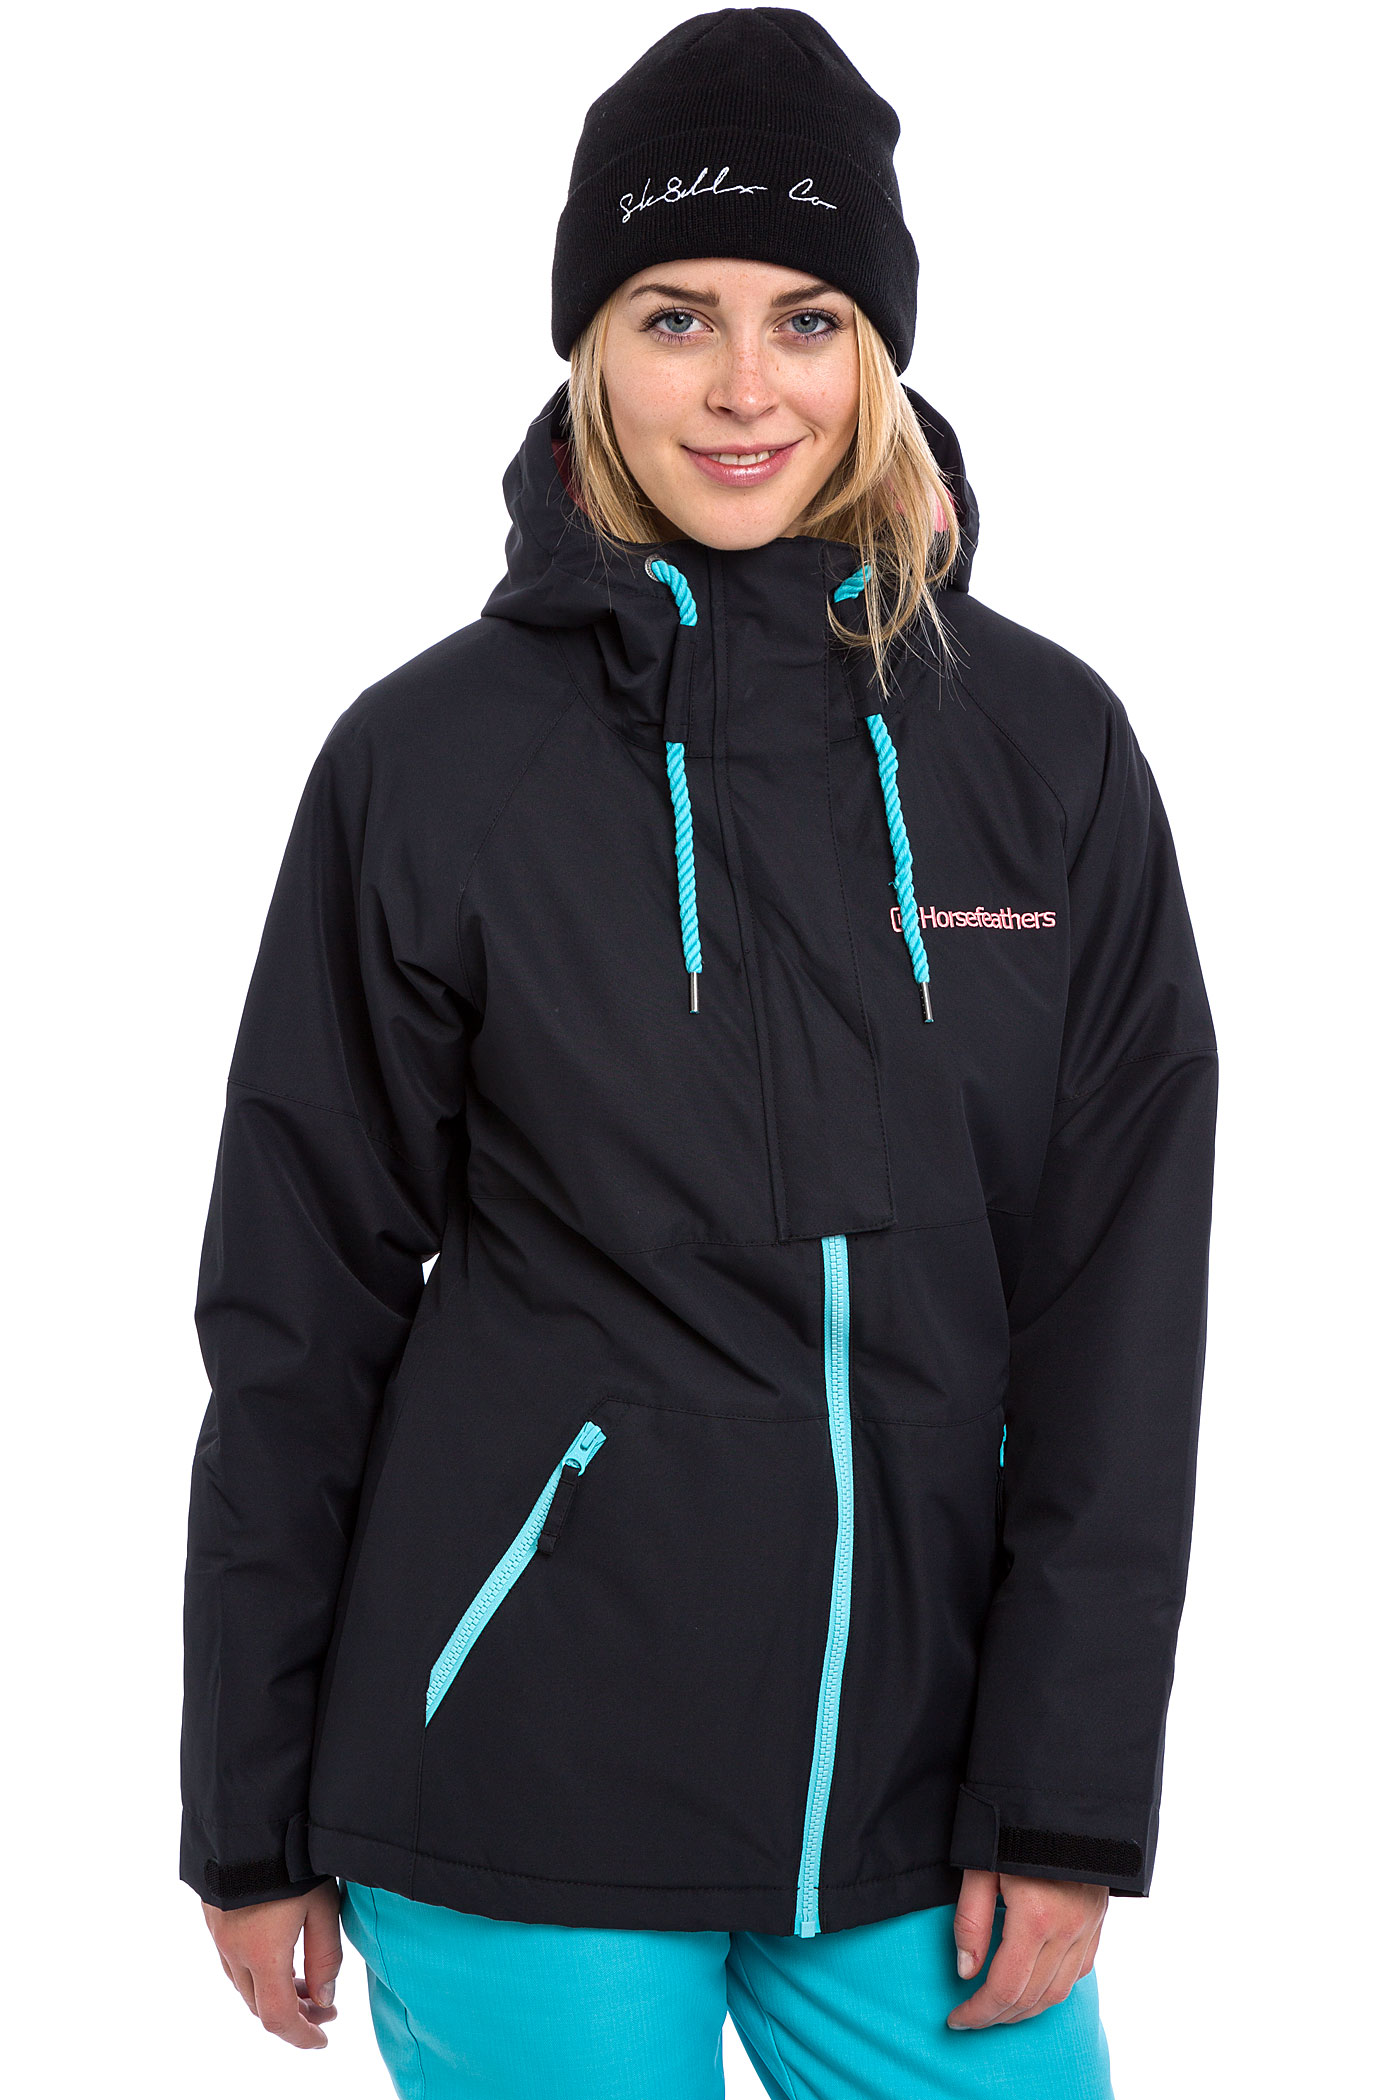 Womens black snowboard jacket